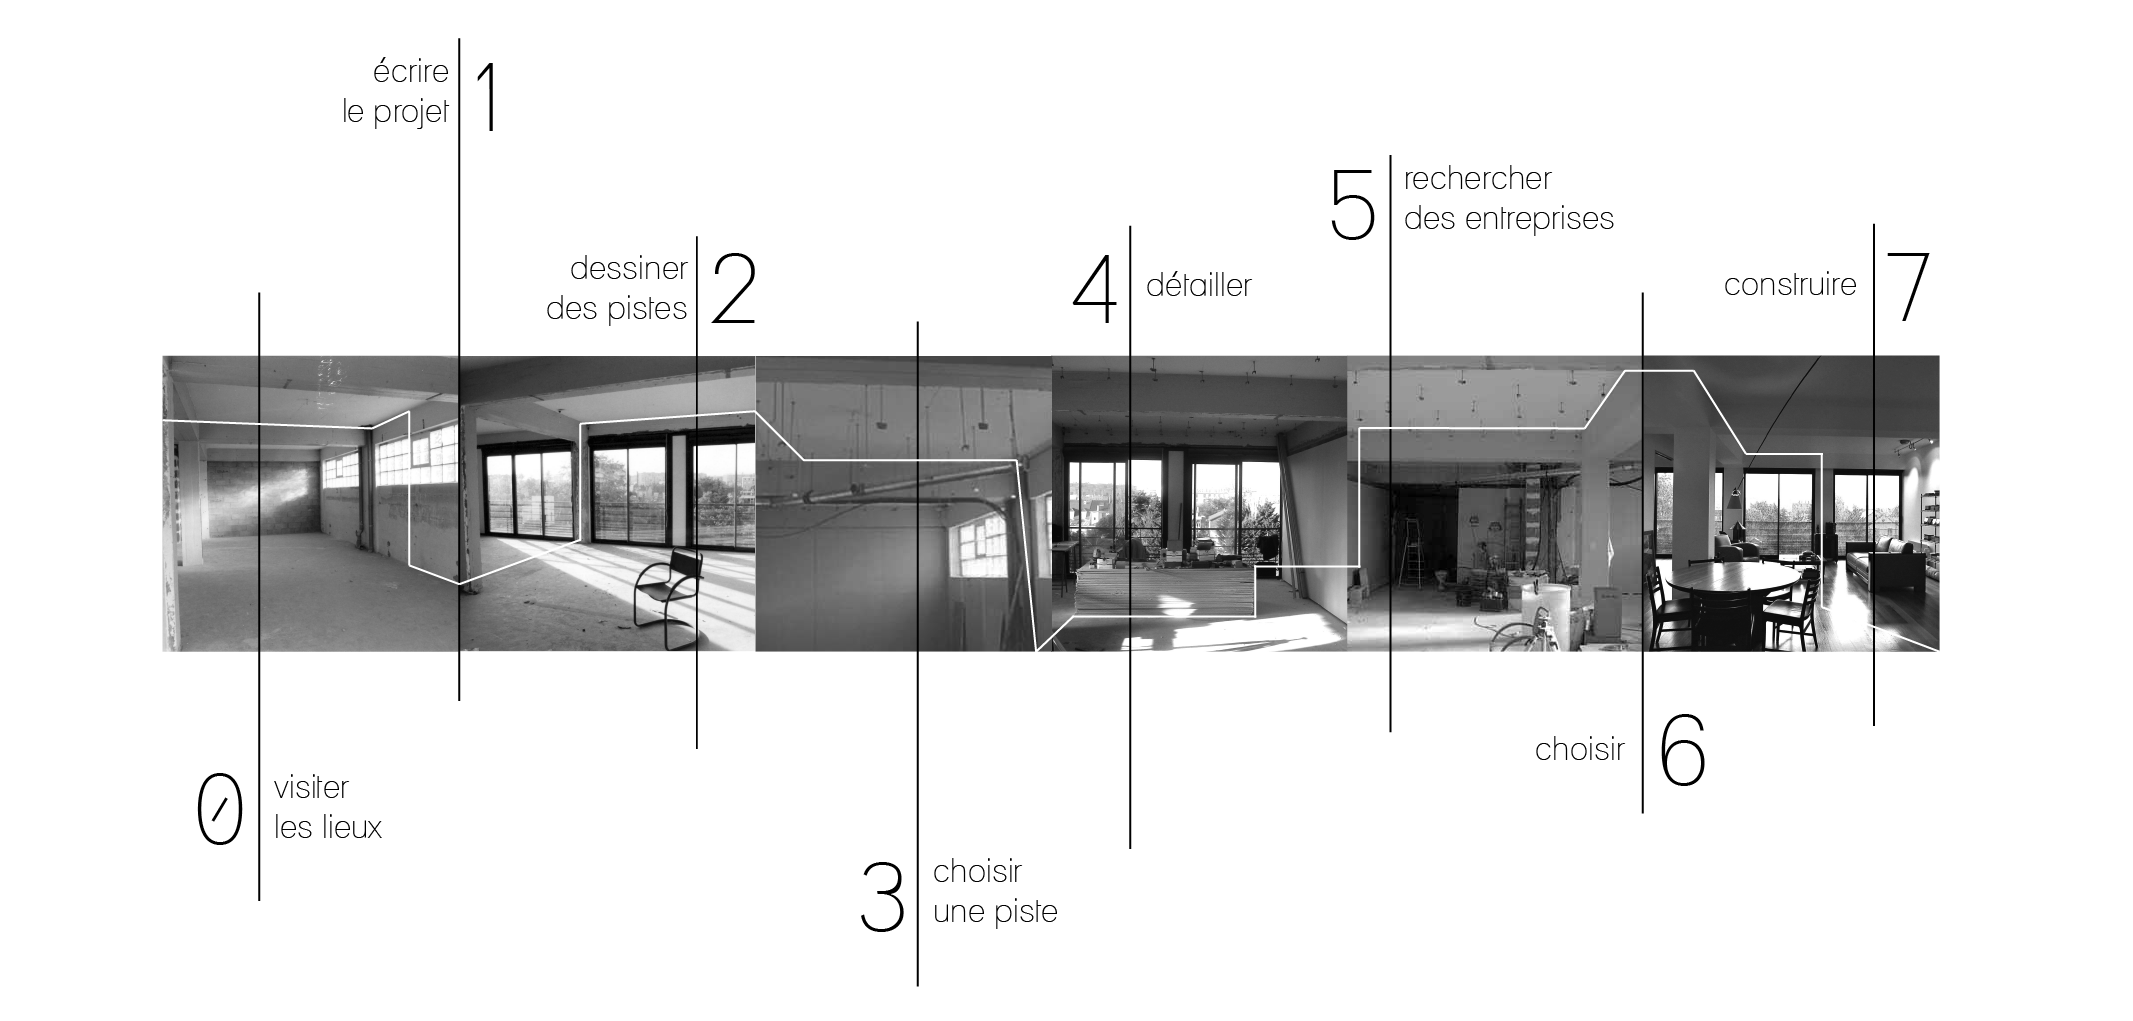 elastic-prestations-architecture-interieure-decoration-design-paris